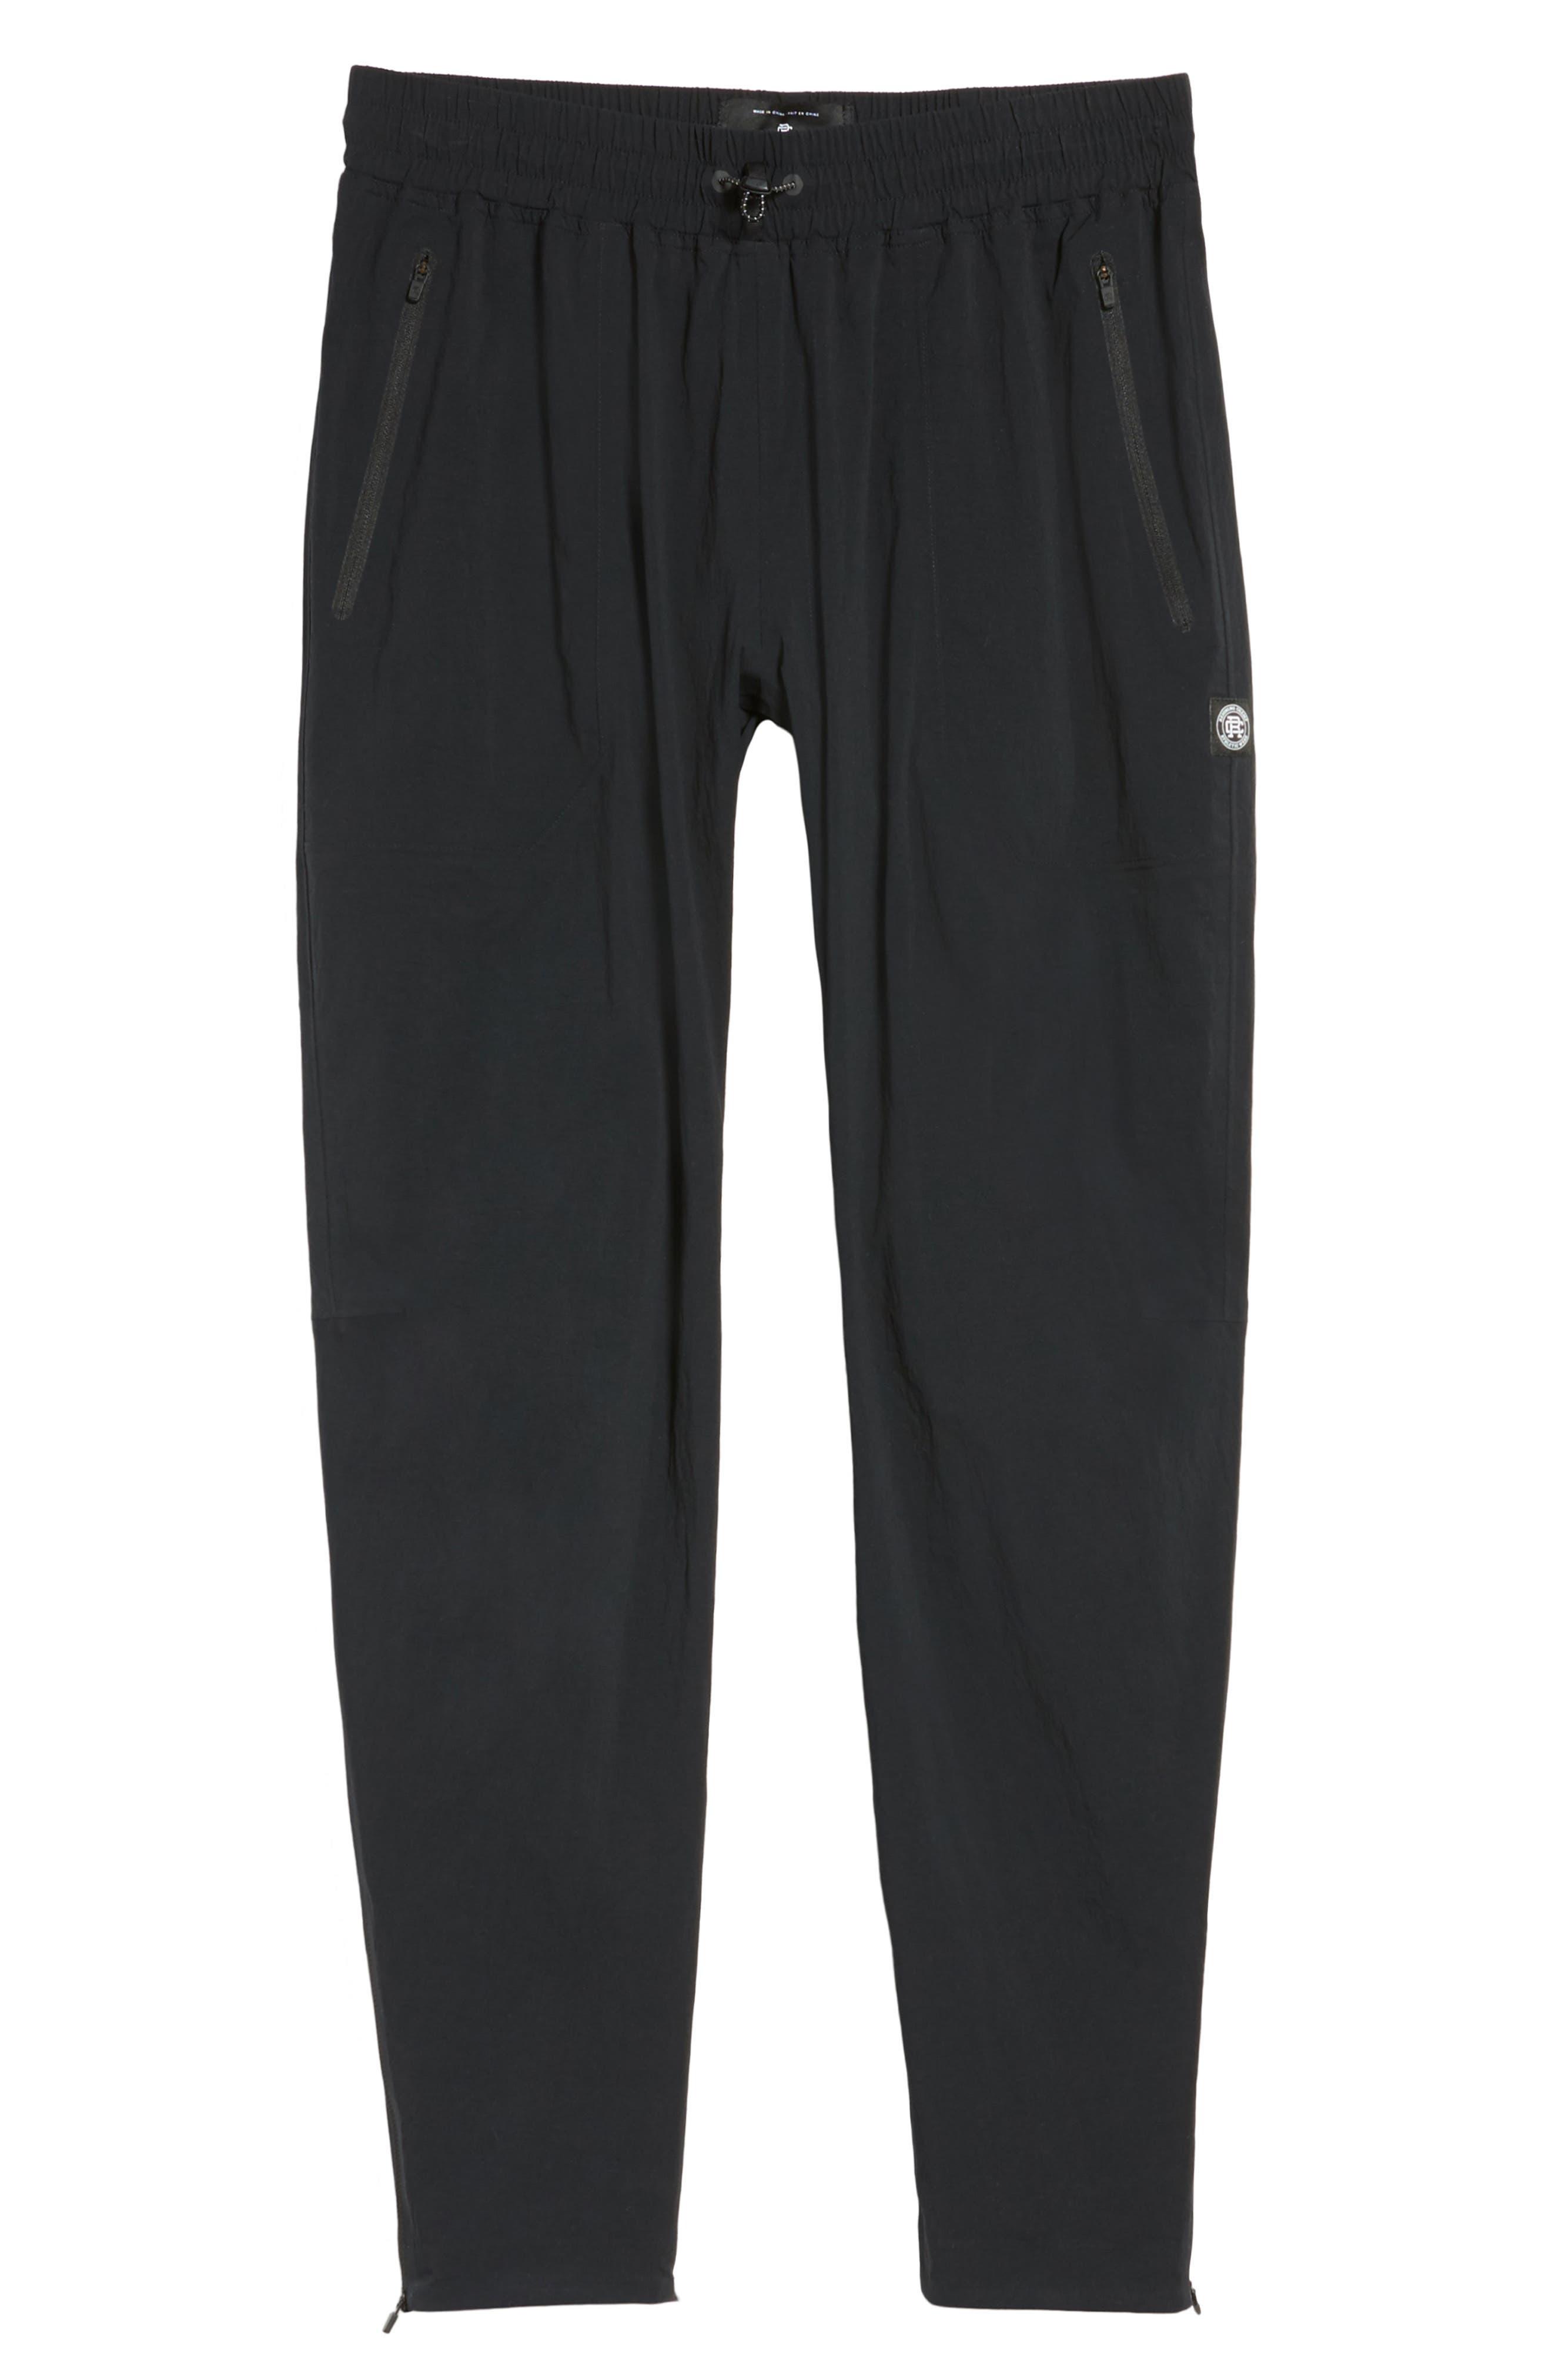 N279 Sweatpants,                             Alternate thumbnail 6, color,                             Black